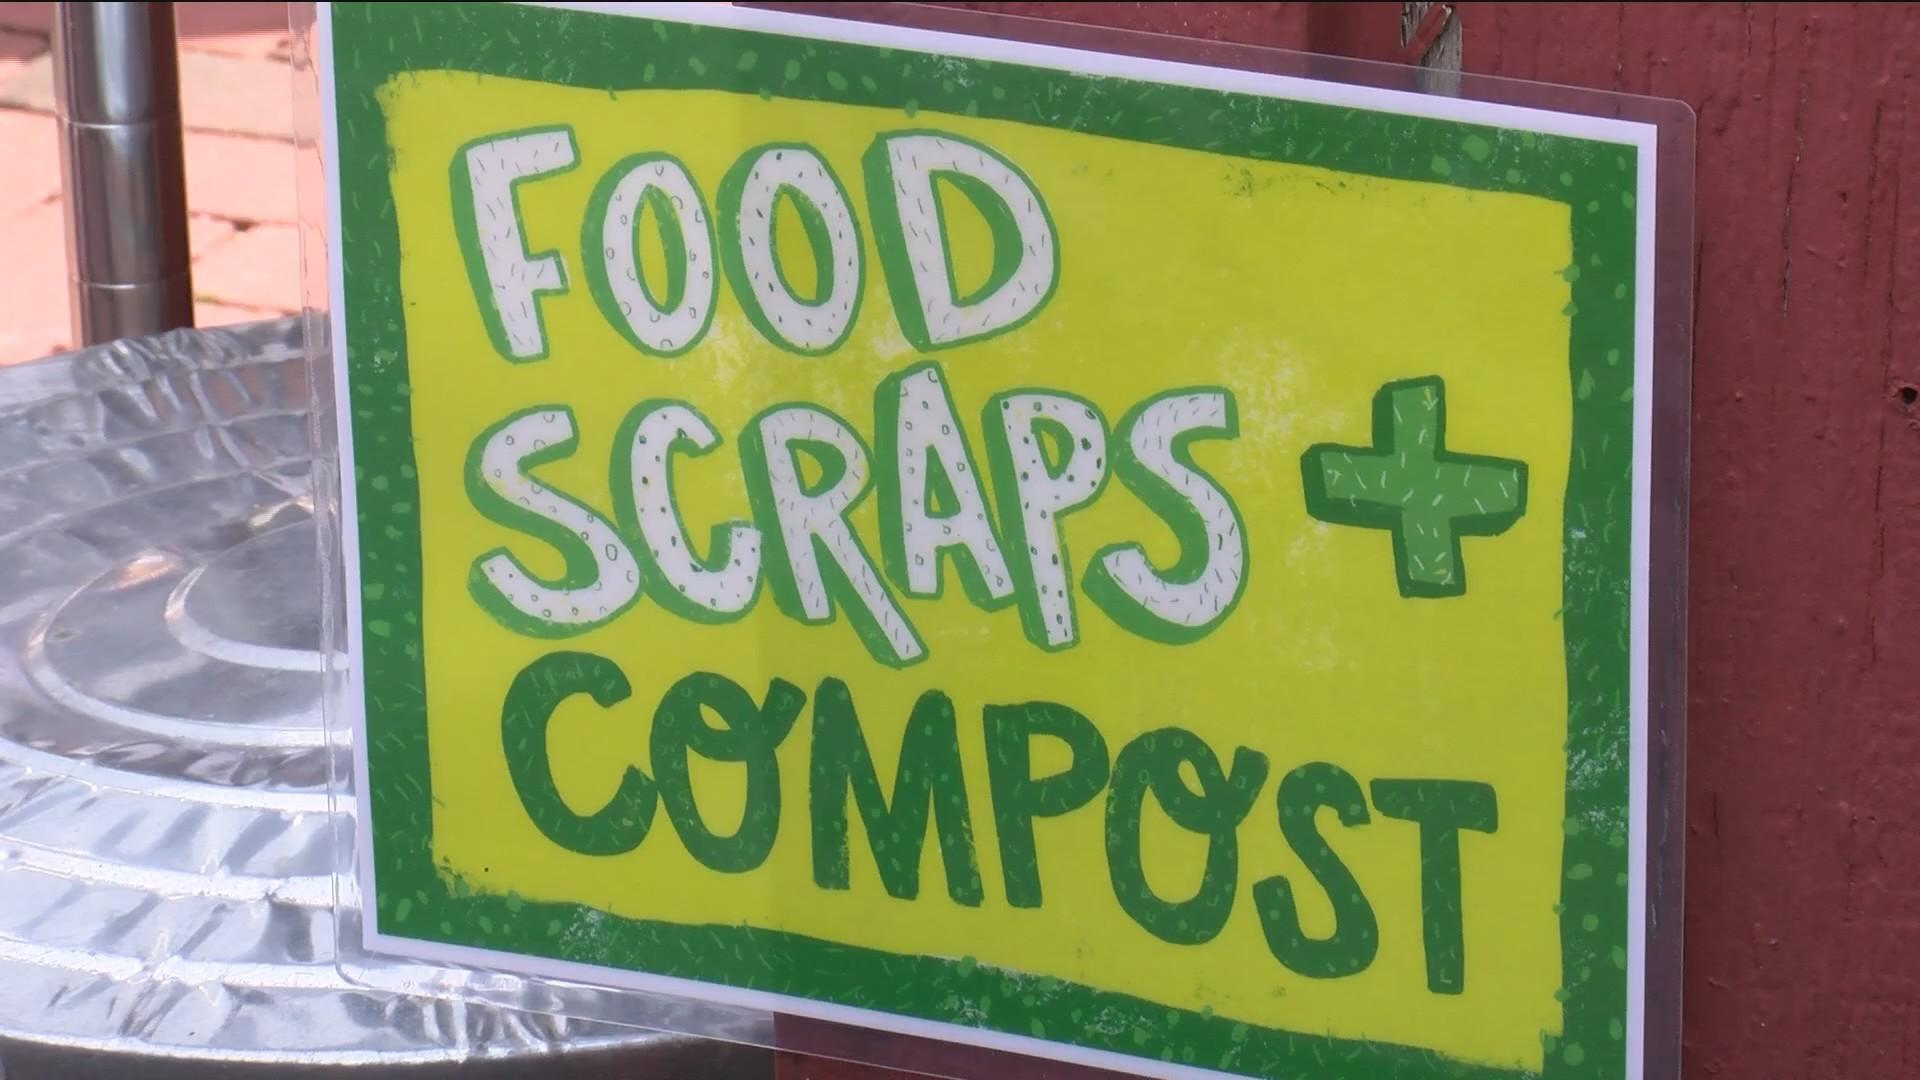 Local_fundraiser_raises_cash_for_compost_0_20190610023226